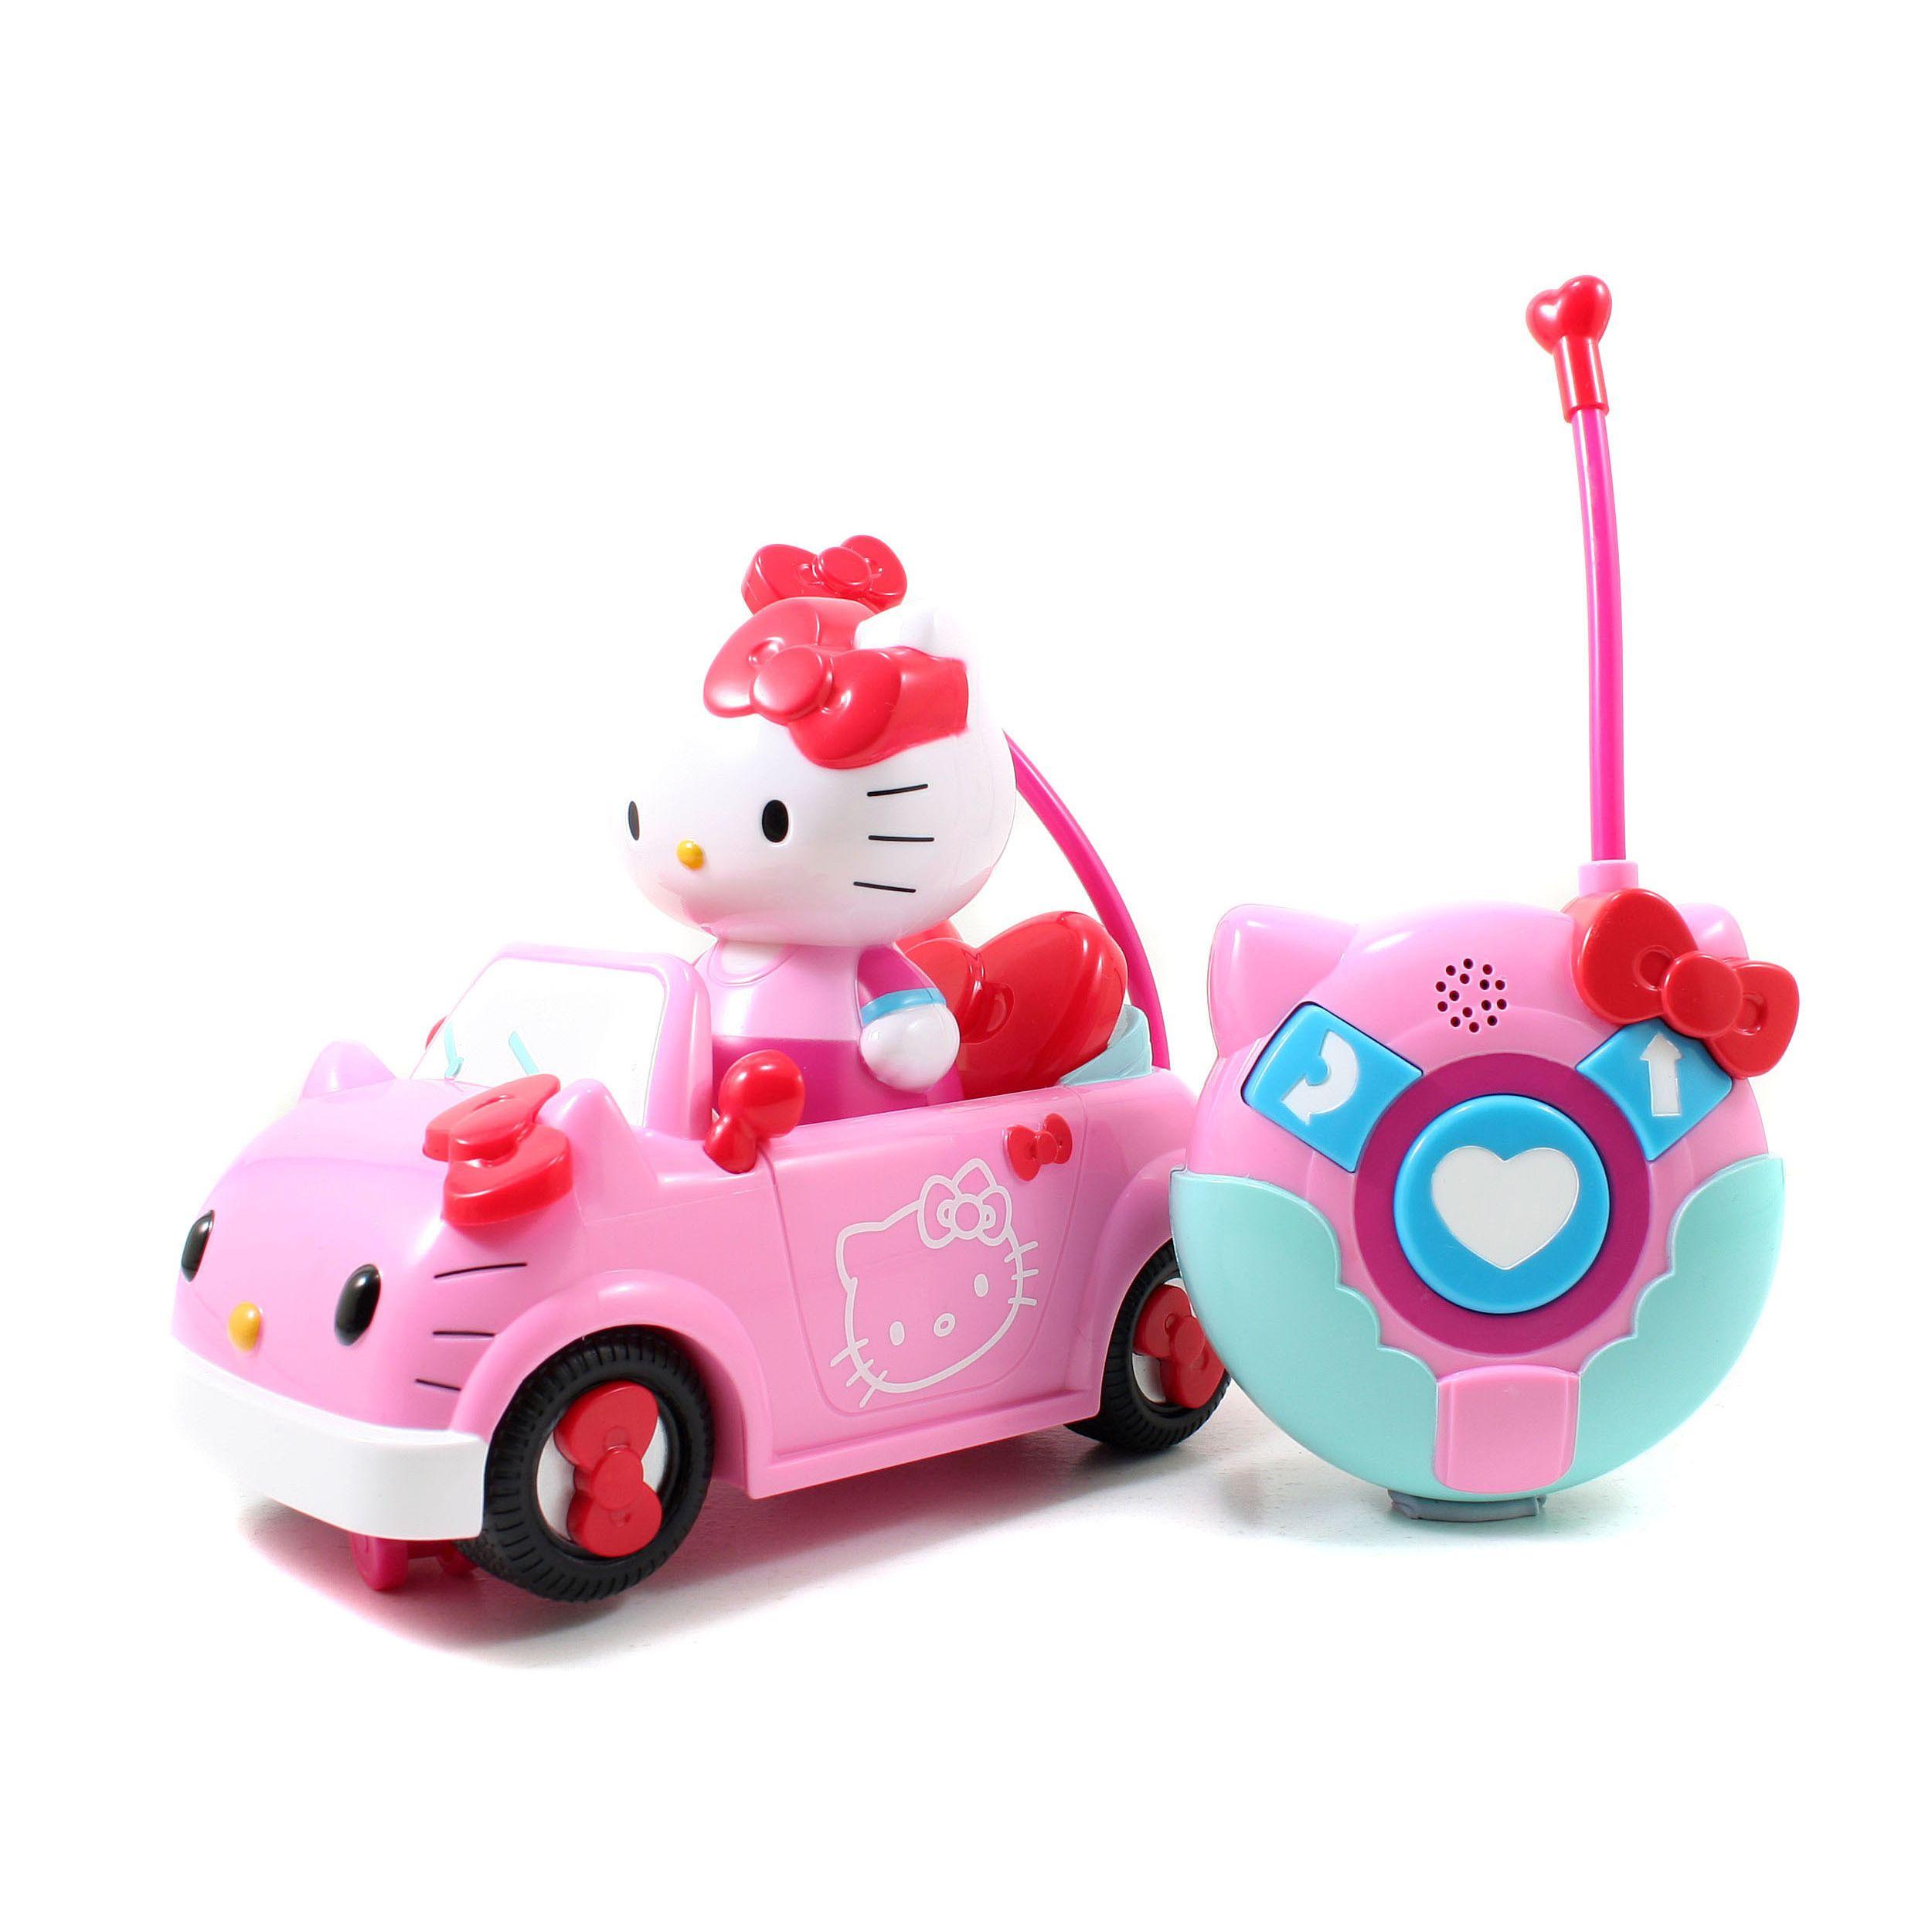 Jada car toys  Jada Toys Hello Kitty Radio Control Vehicle   Products